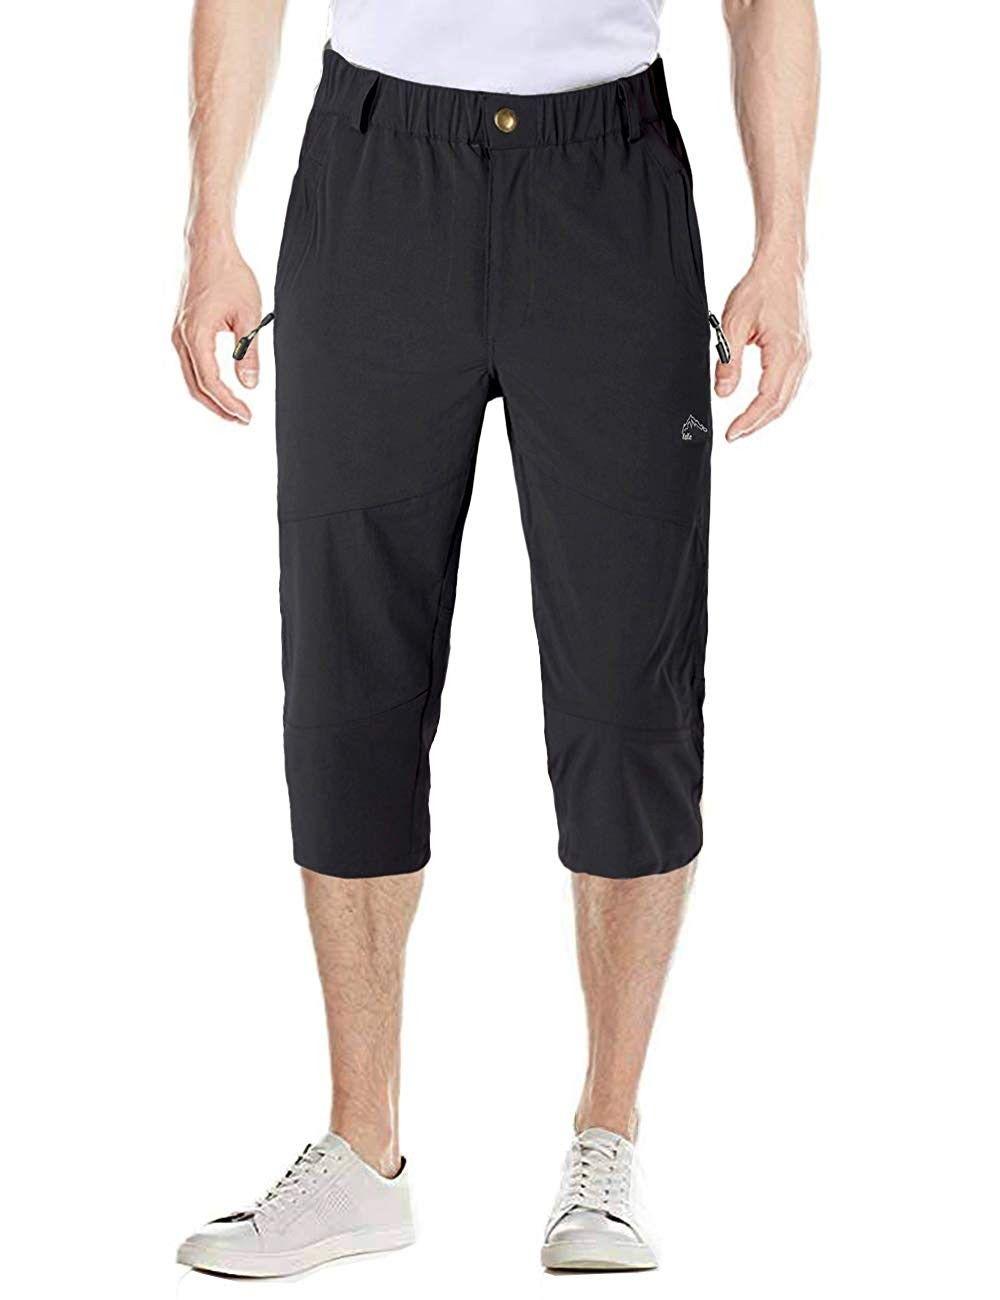 Men S Capri Pants Elastic Knee Length Shorts 3 4 Shorts Quick Dry Multi Pockets Cargo Capri Shorts Black Ca18nw0taam Size 30 Mens Capri Pants Knee Length Shorts Mens Outdoor Clothing [ 1300 x 1000 Pixel ]